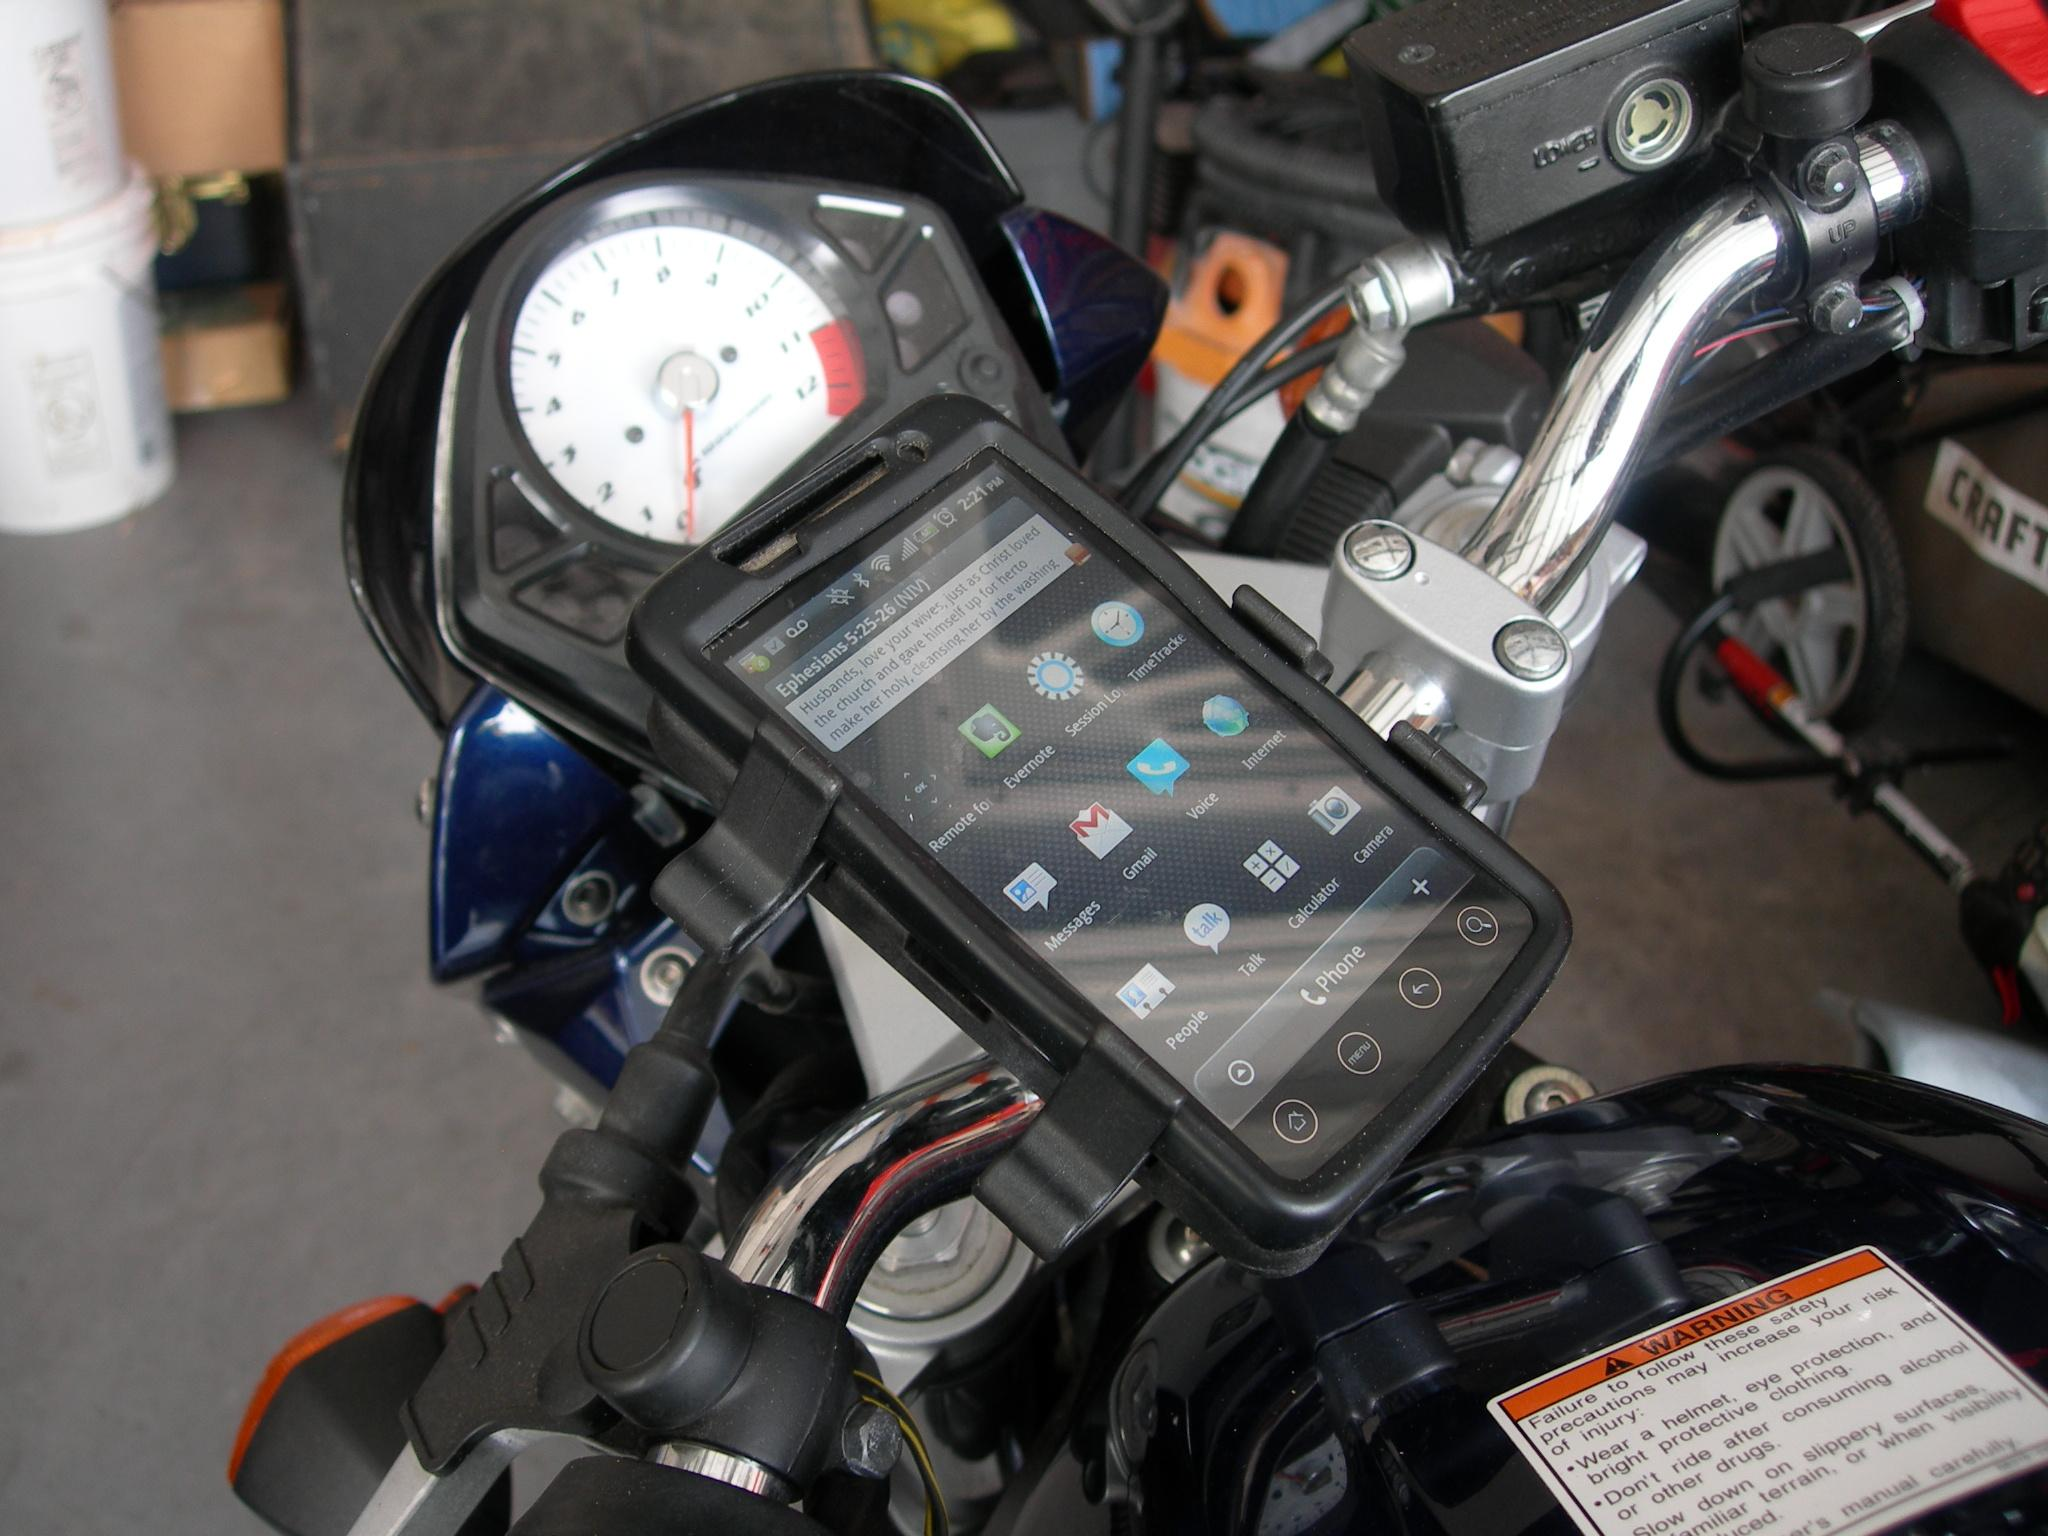 RAM Mount HTC EVO 4G on Suzuki motorcycle Gallery Article